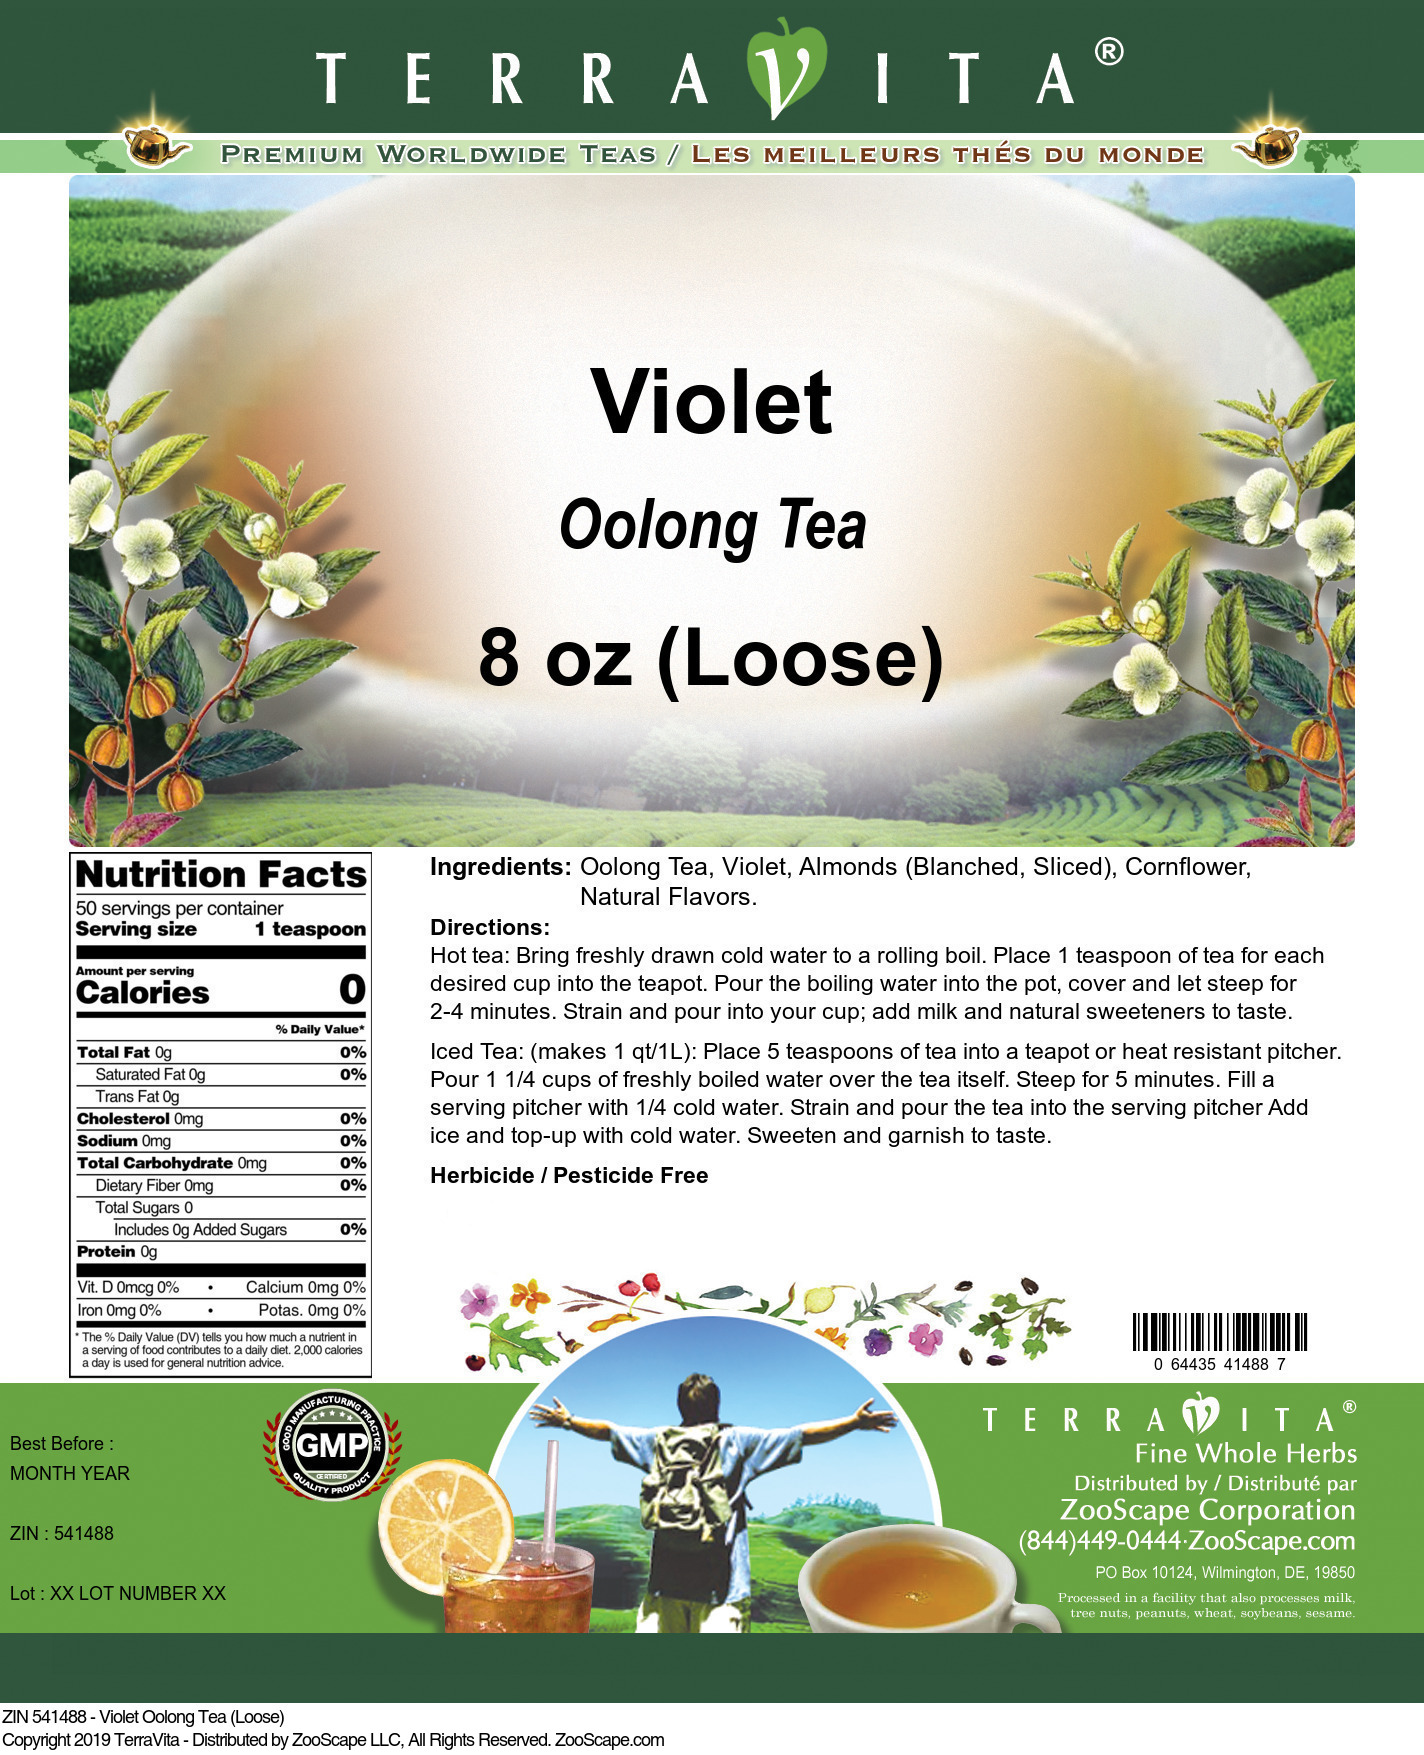 Violet Oolong Tea